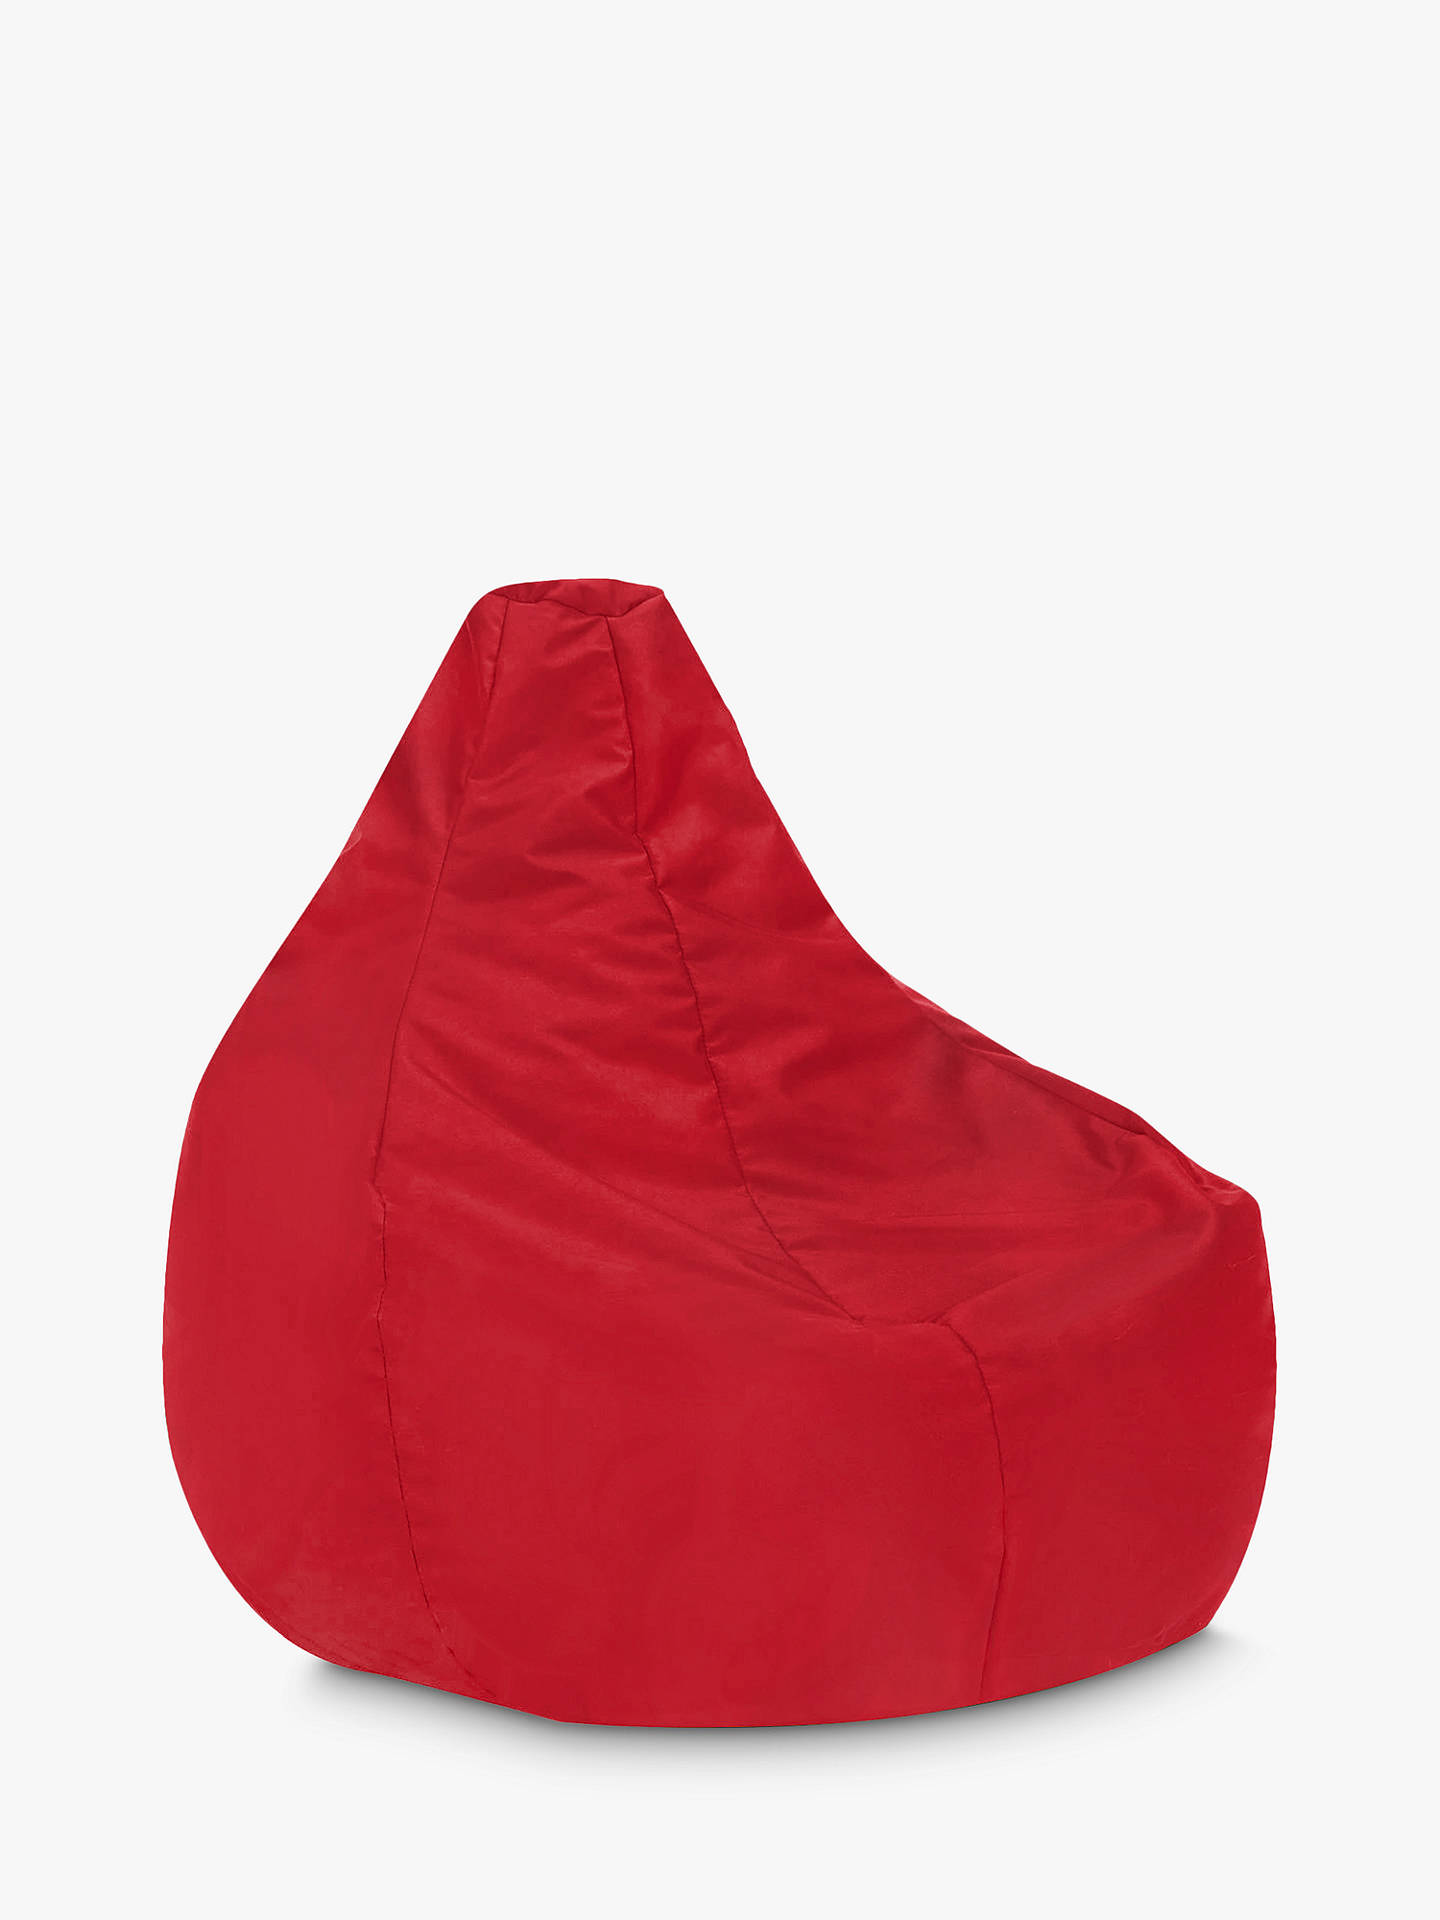 John Lewis Amp Partners Max Indoor Outdoor Bean Bag At